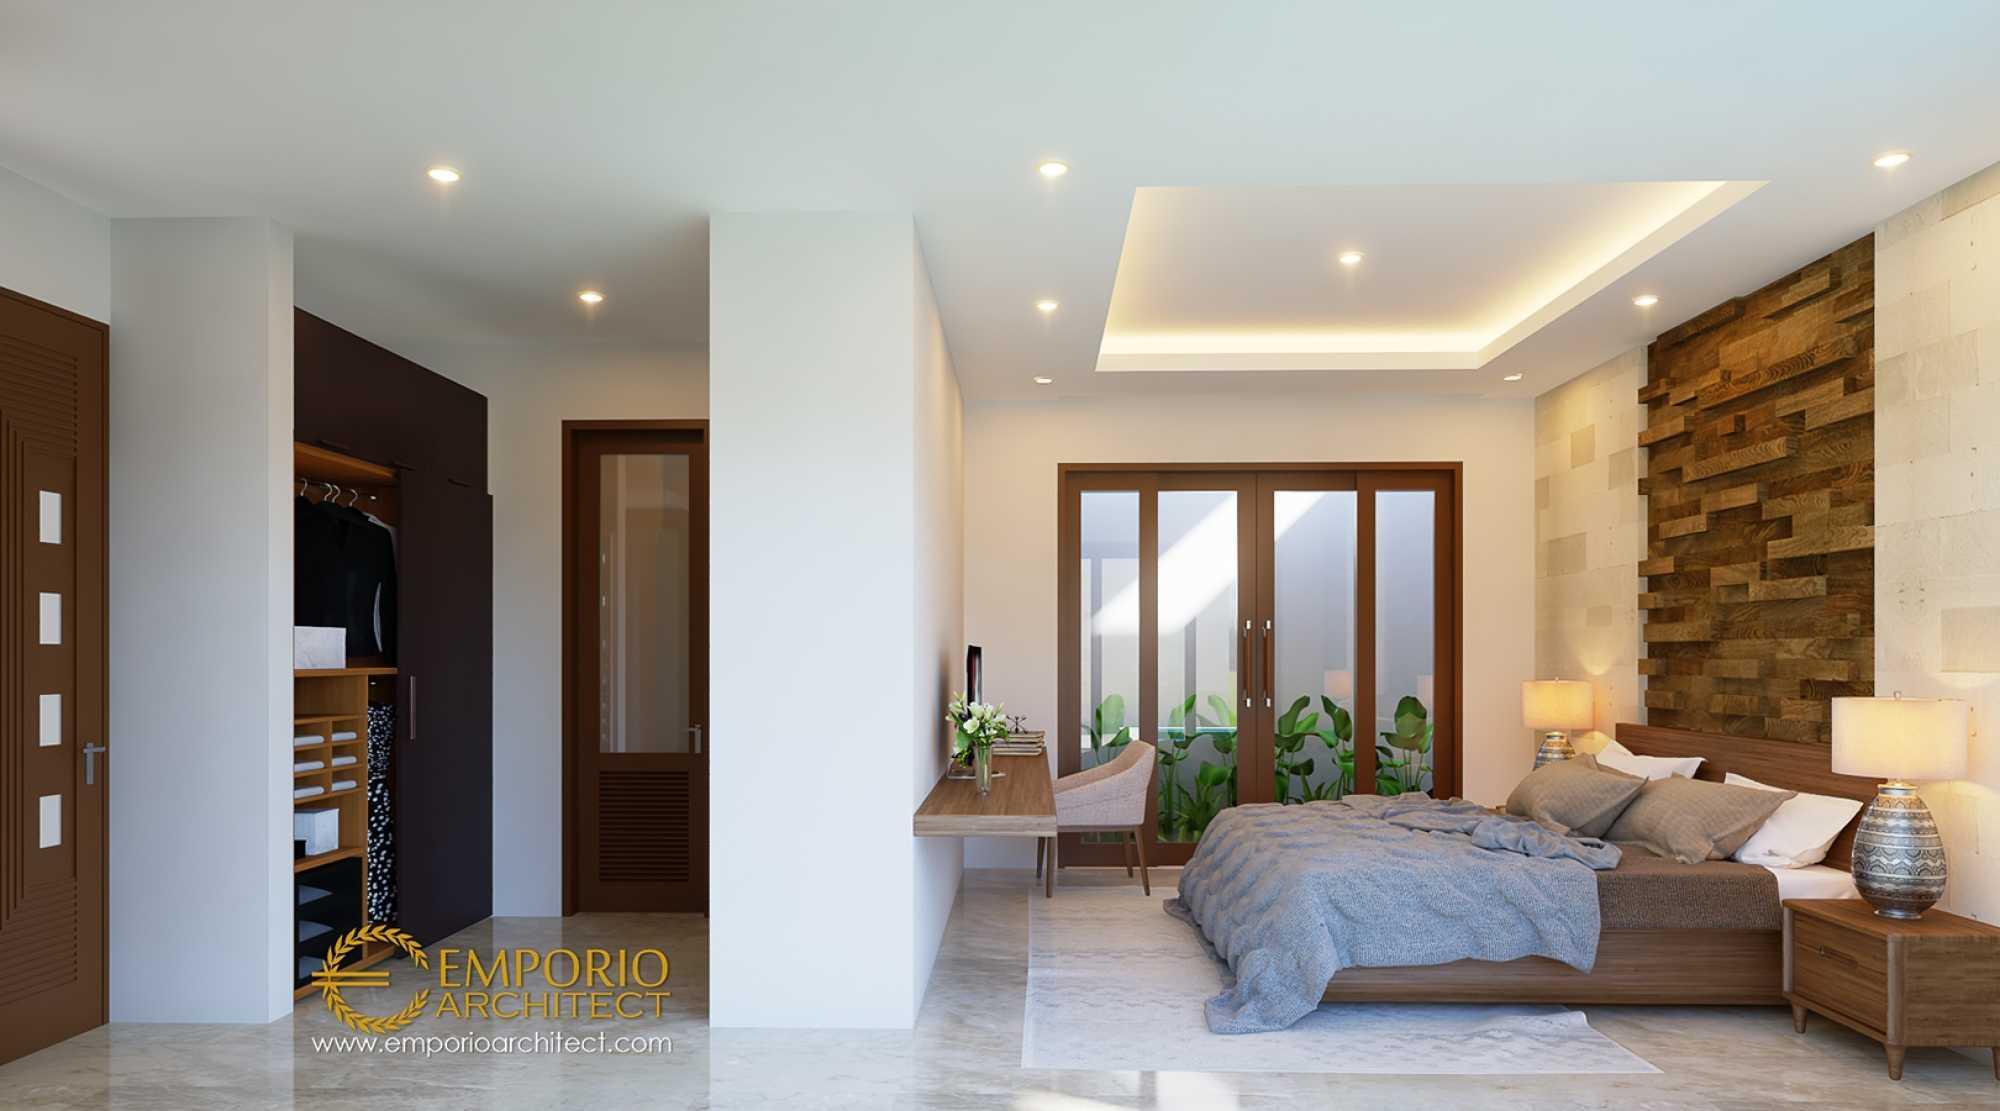 Emporio Architect Desain Rumah Villa Bali Tropis 409 @ Madiun, Jawa Timur Madiun, Kota Madiun, Jawa Timur, Indonesia Madiun, Kota Madiun, Jawa Timur, Indonesia Emporio-Architect-Desain-Rumah-Villa-Bali-Tropis-409-Madiun-Jawa-Timur  77298